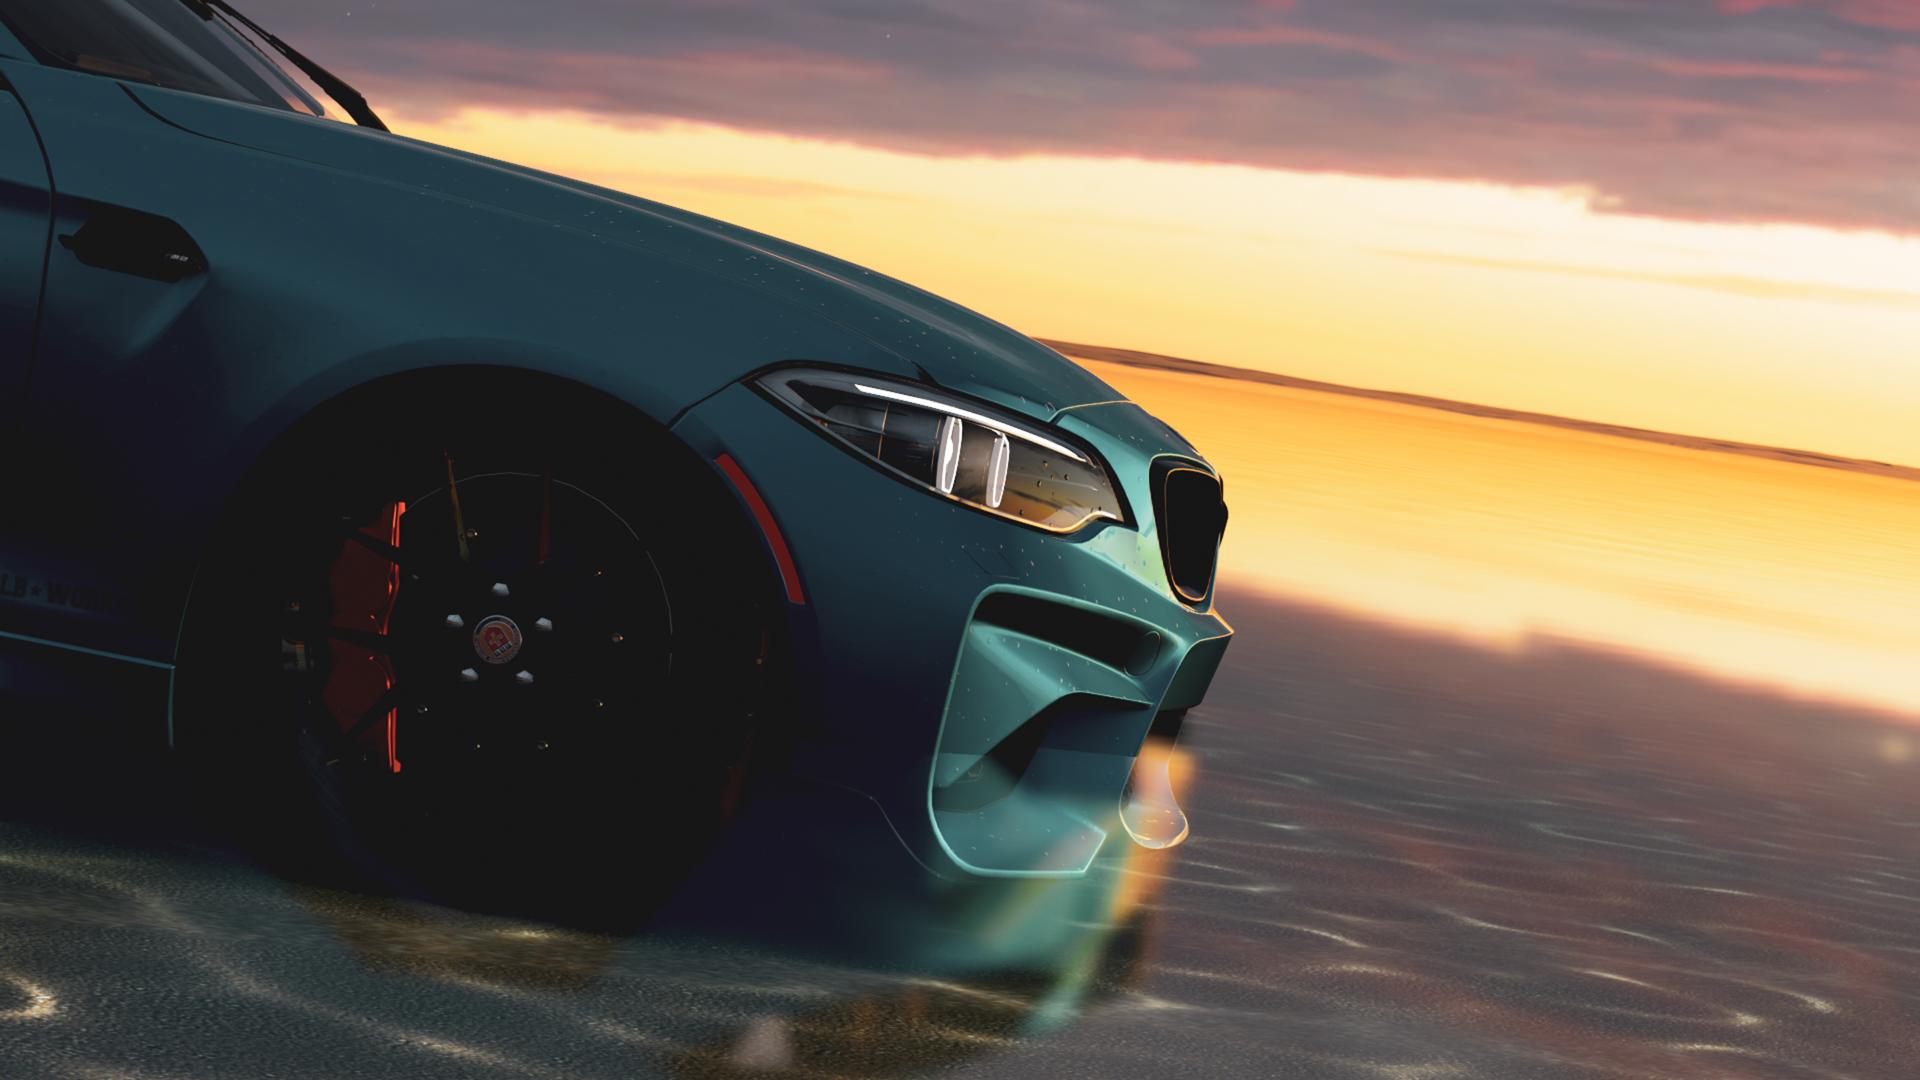 Wallpaper : BMW, Forza Horizon, forza horizon 3, PC gaming